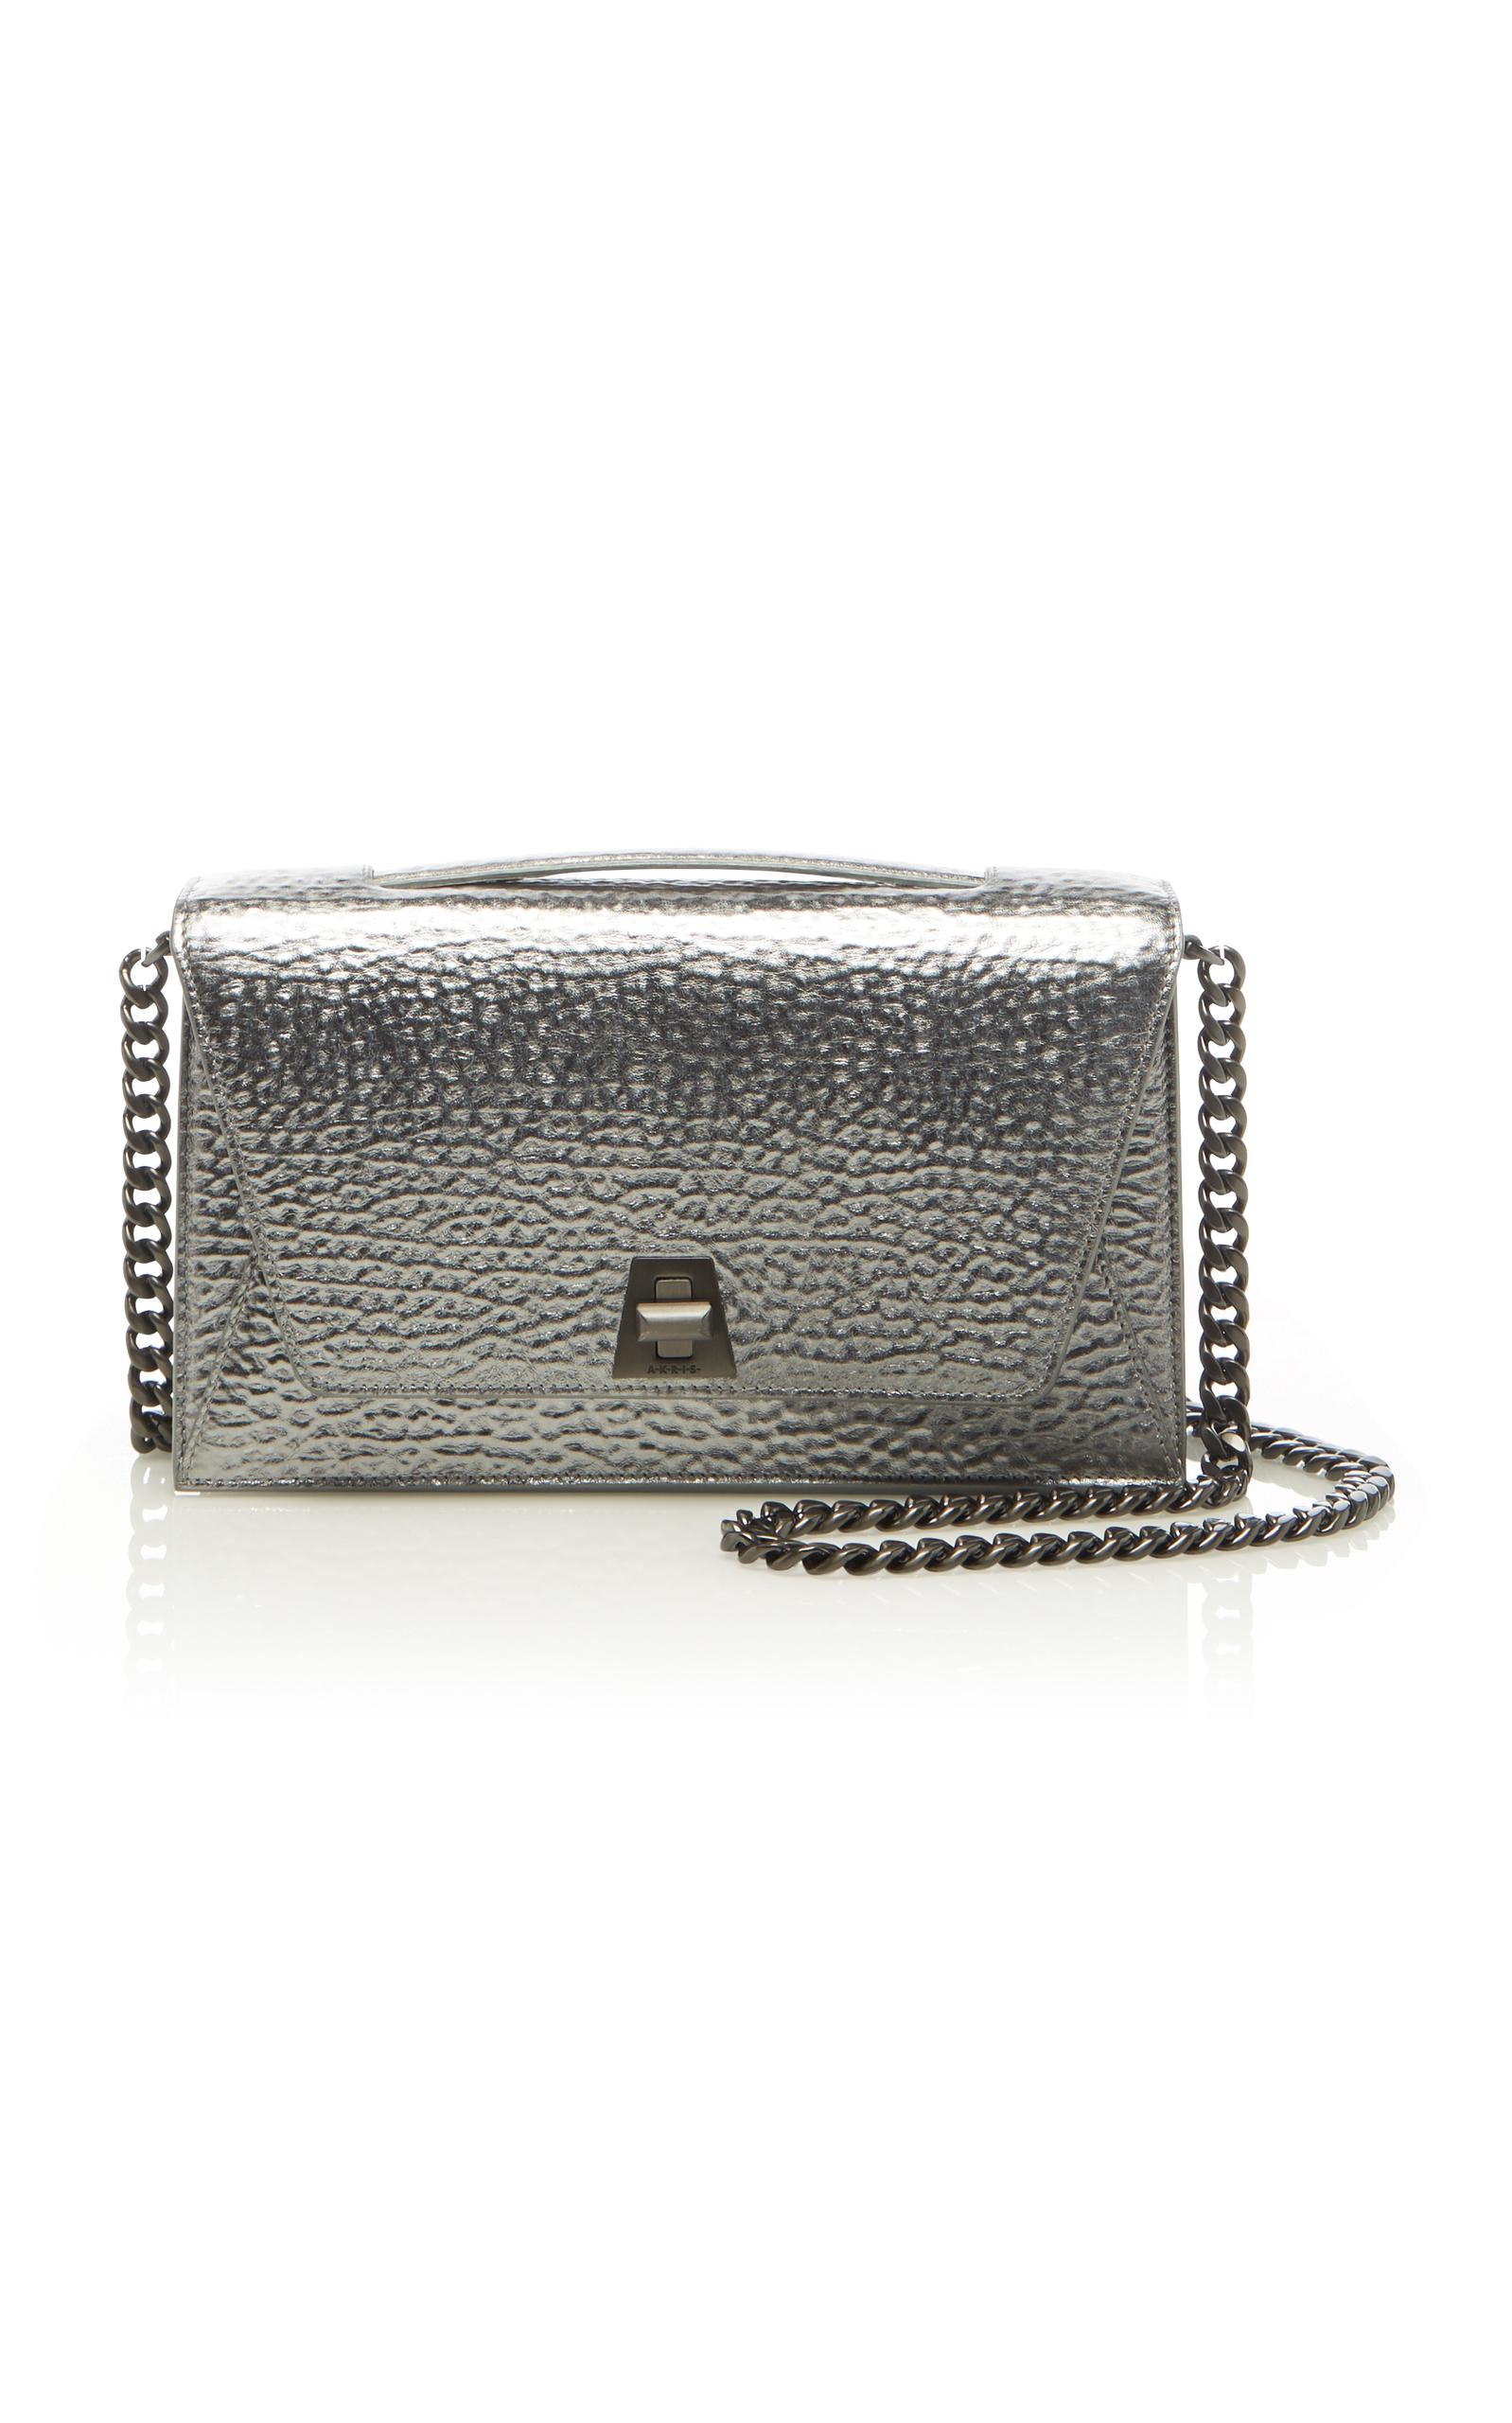 Small Leather Goods - Belts Akris nhL8GvfBZ